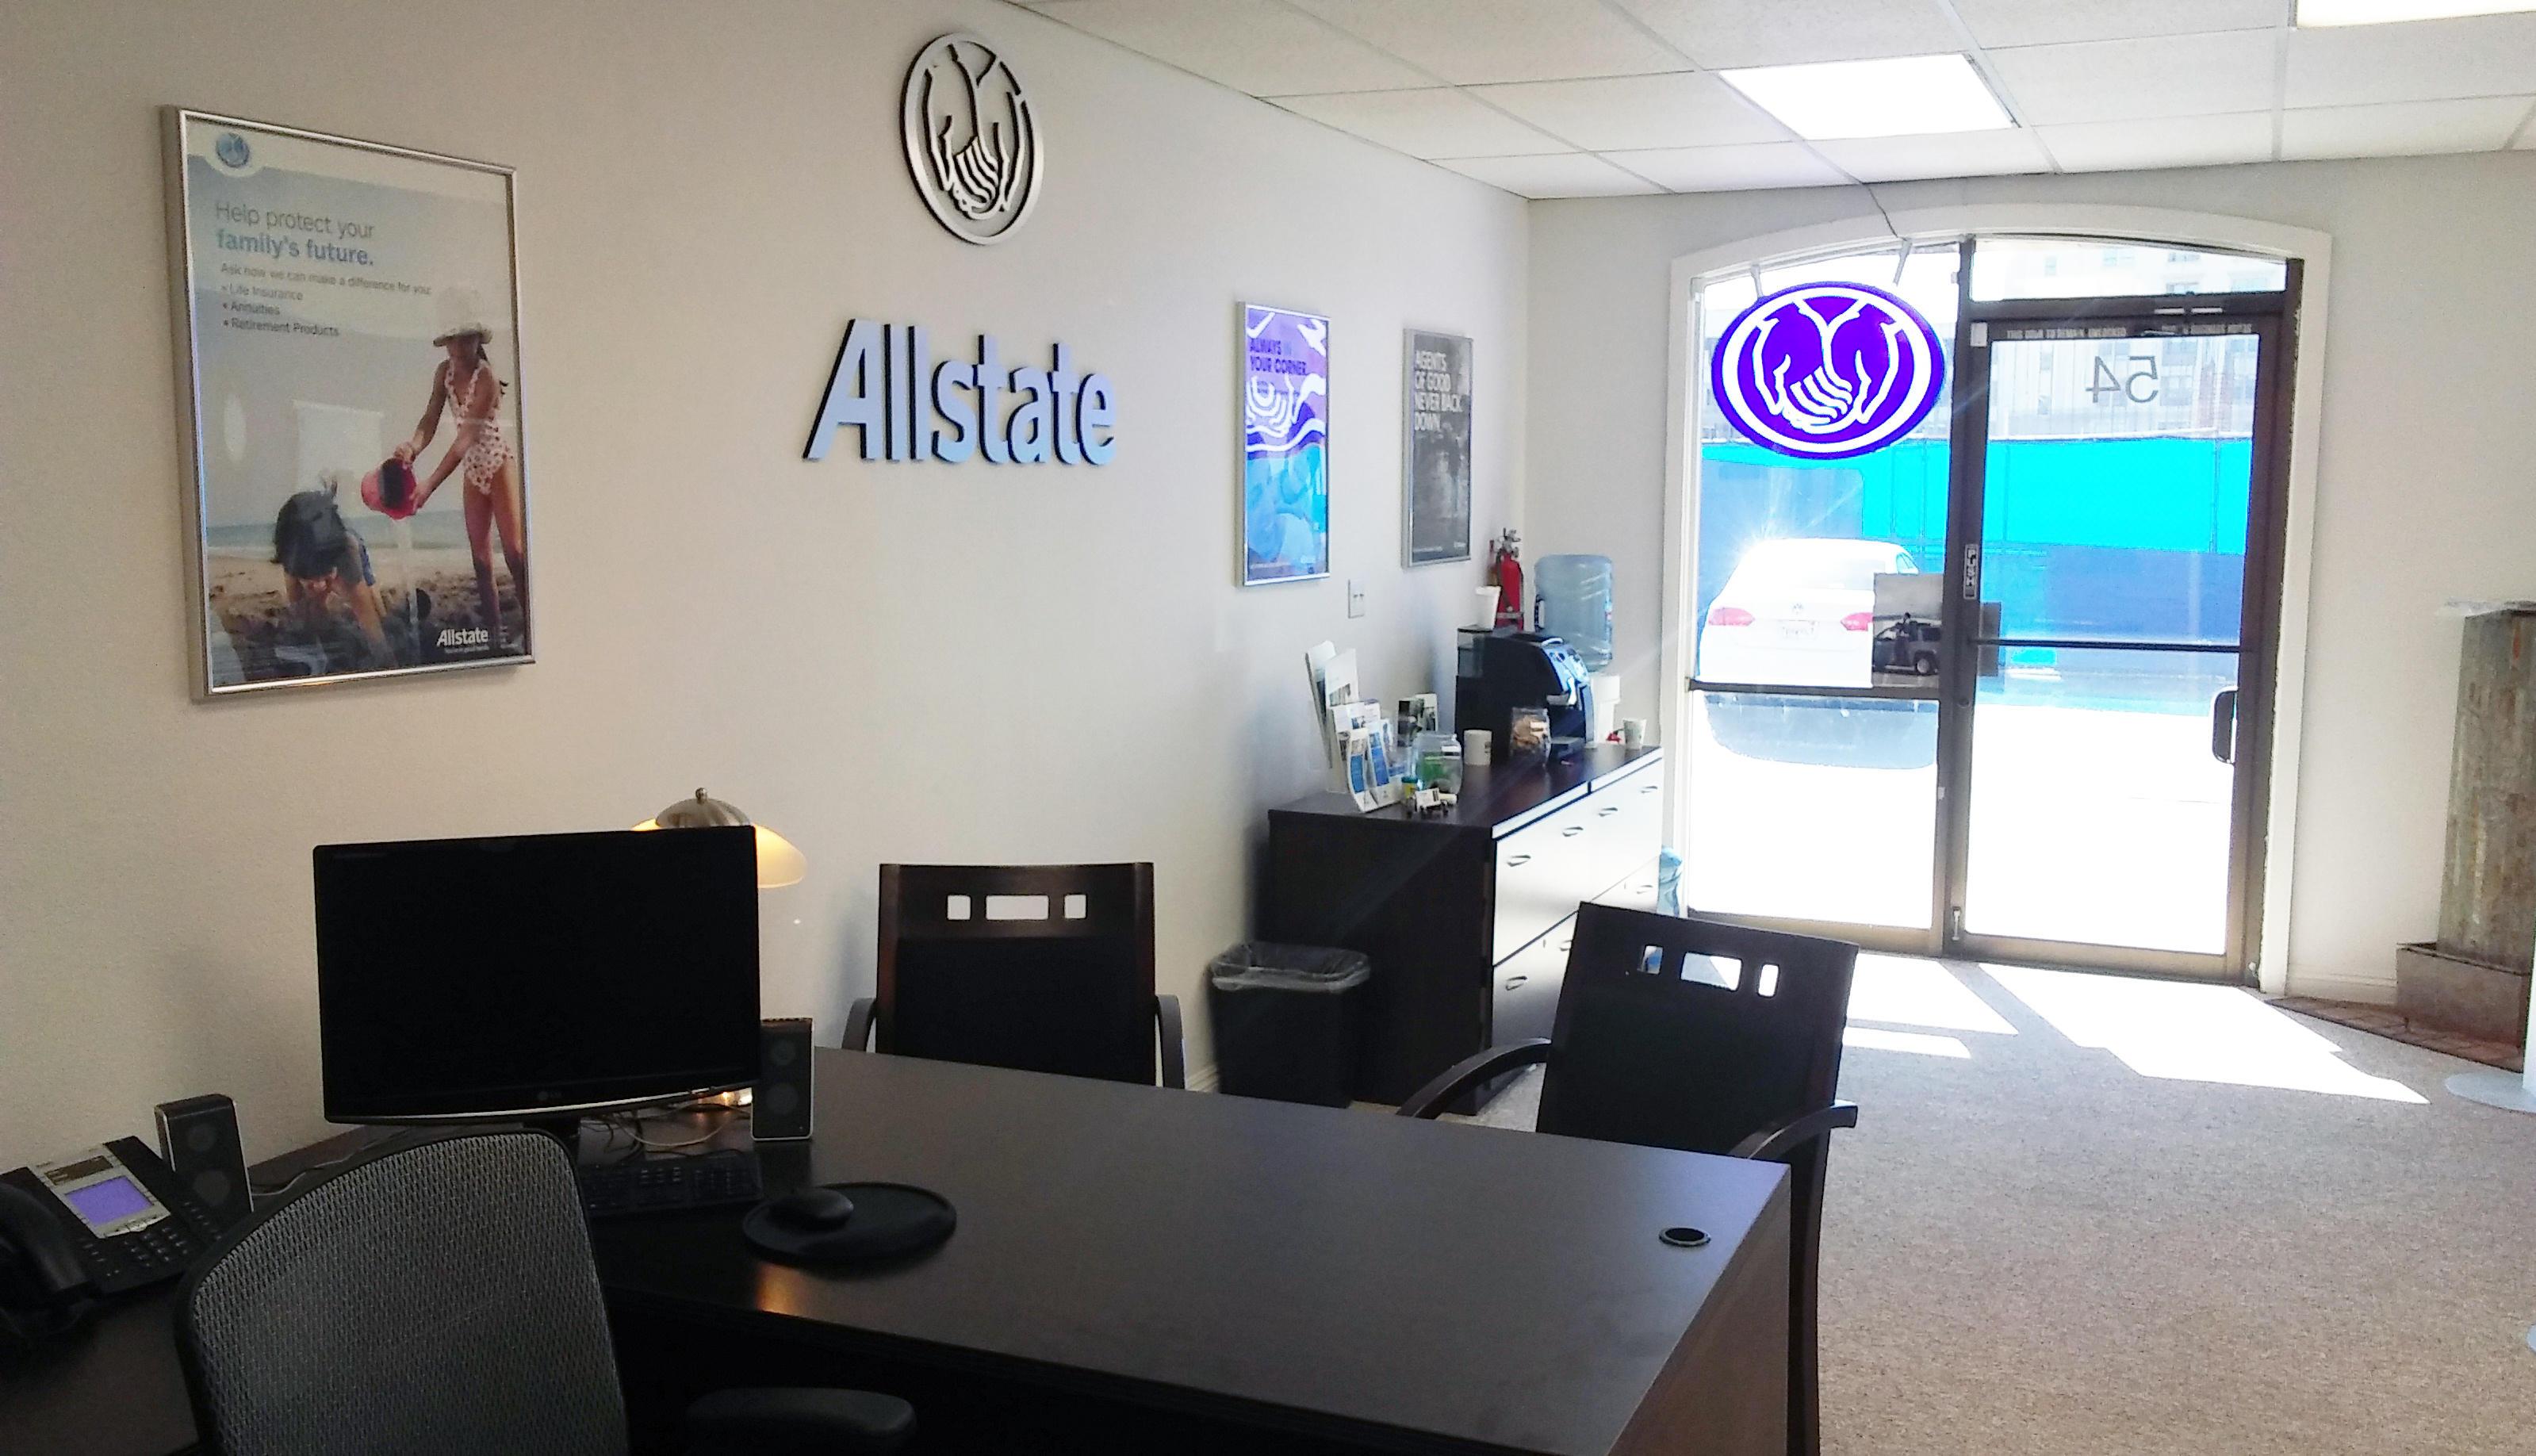 Allstate Insurance Agent: Entrada Premier Ins Ctr image 2